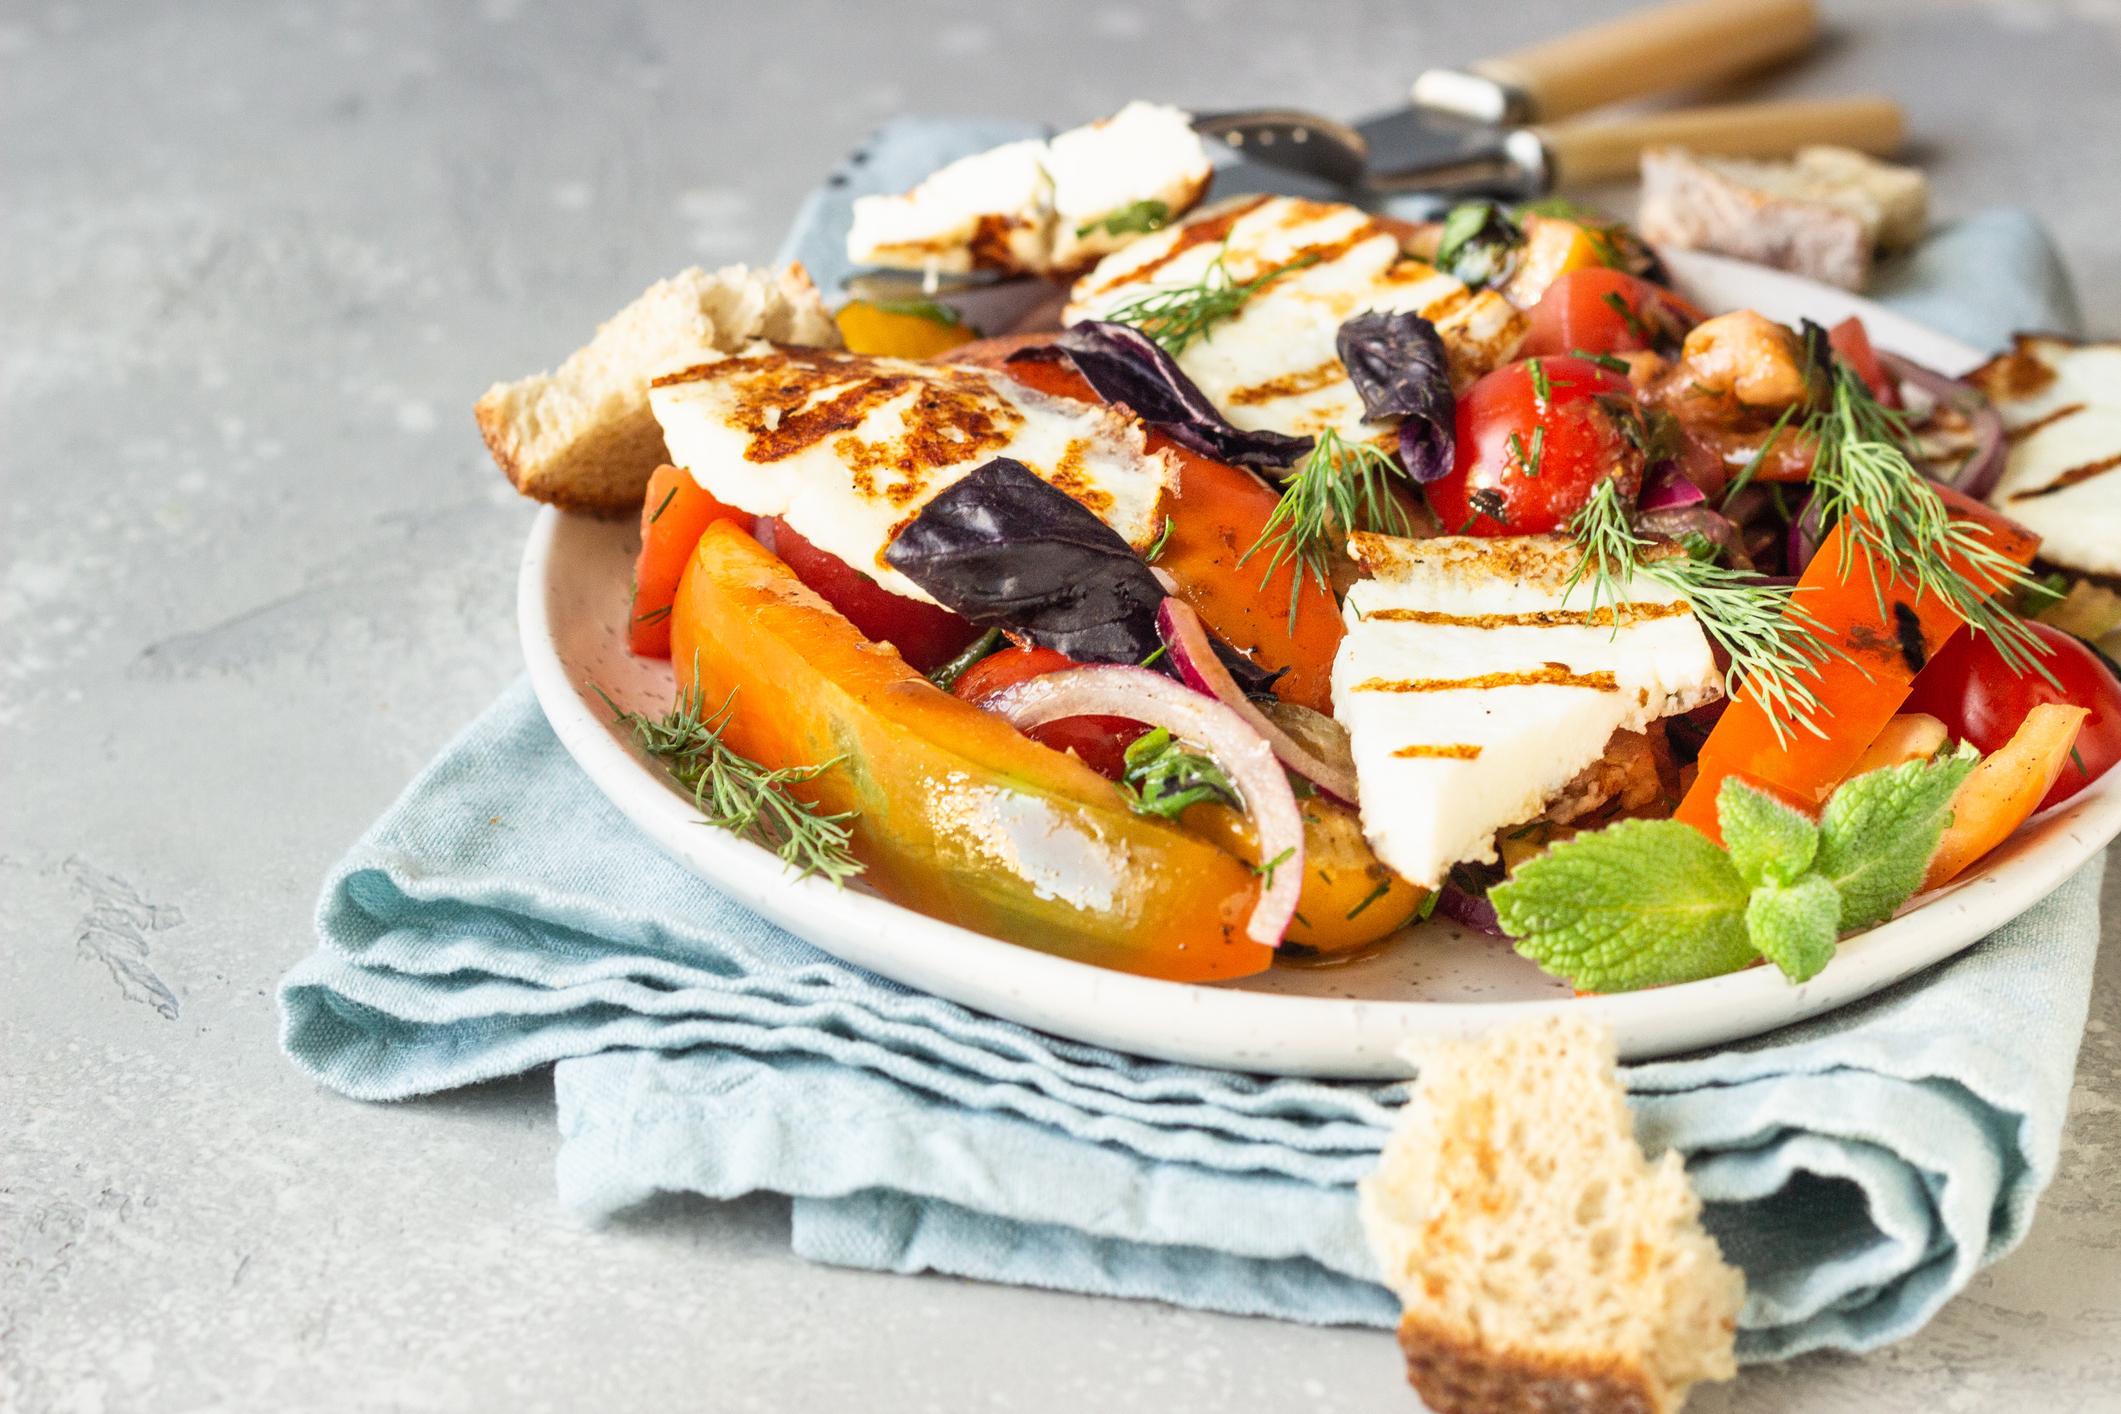 Salade de légumes rôtis et halloumi